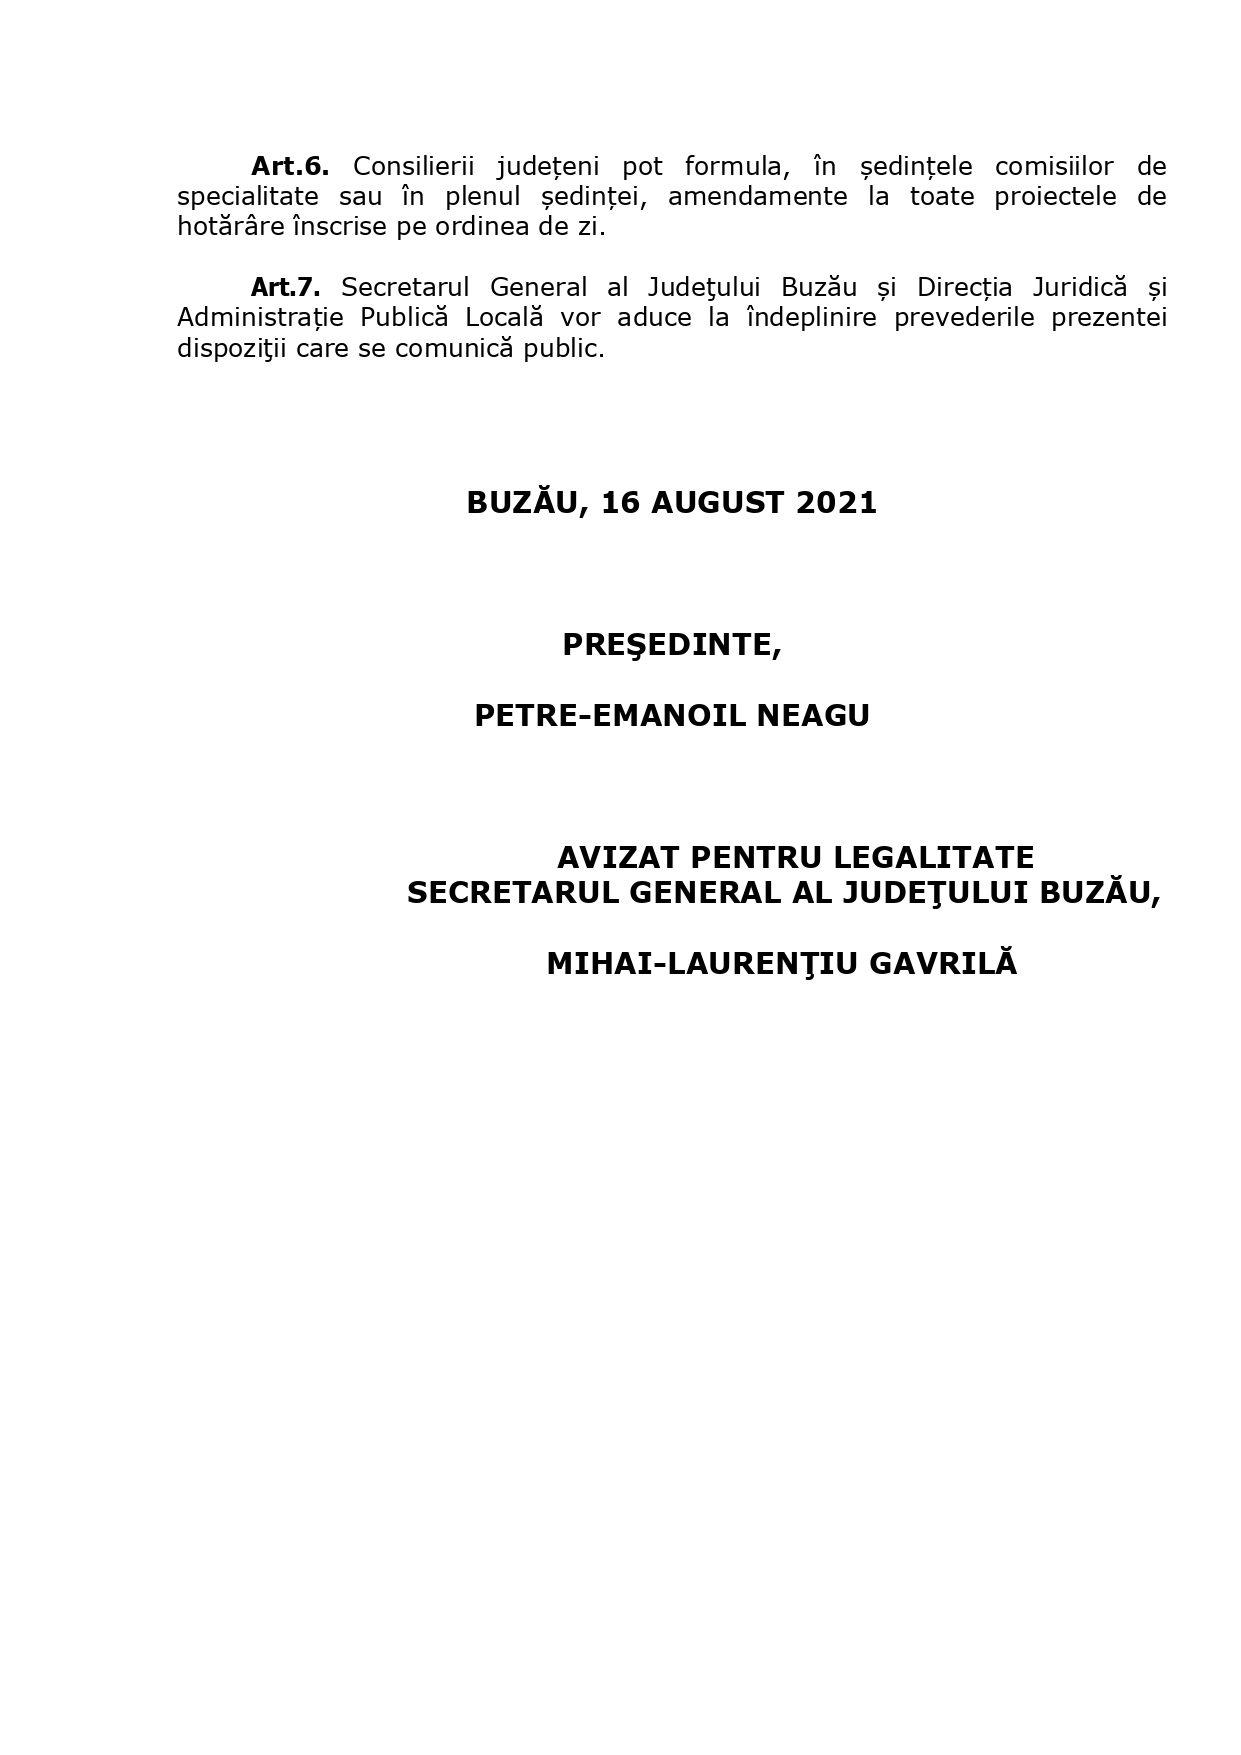 Disp. conv. 26 aug. 2021 page 0004